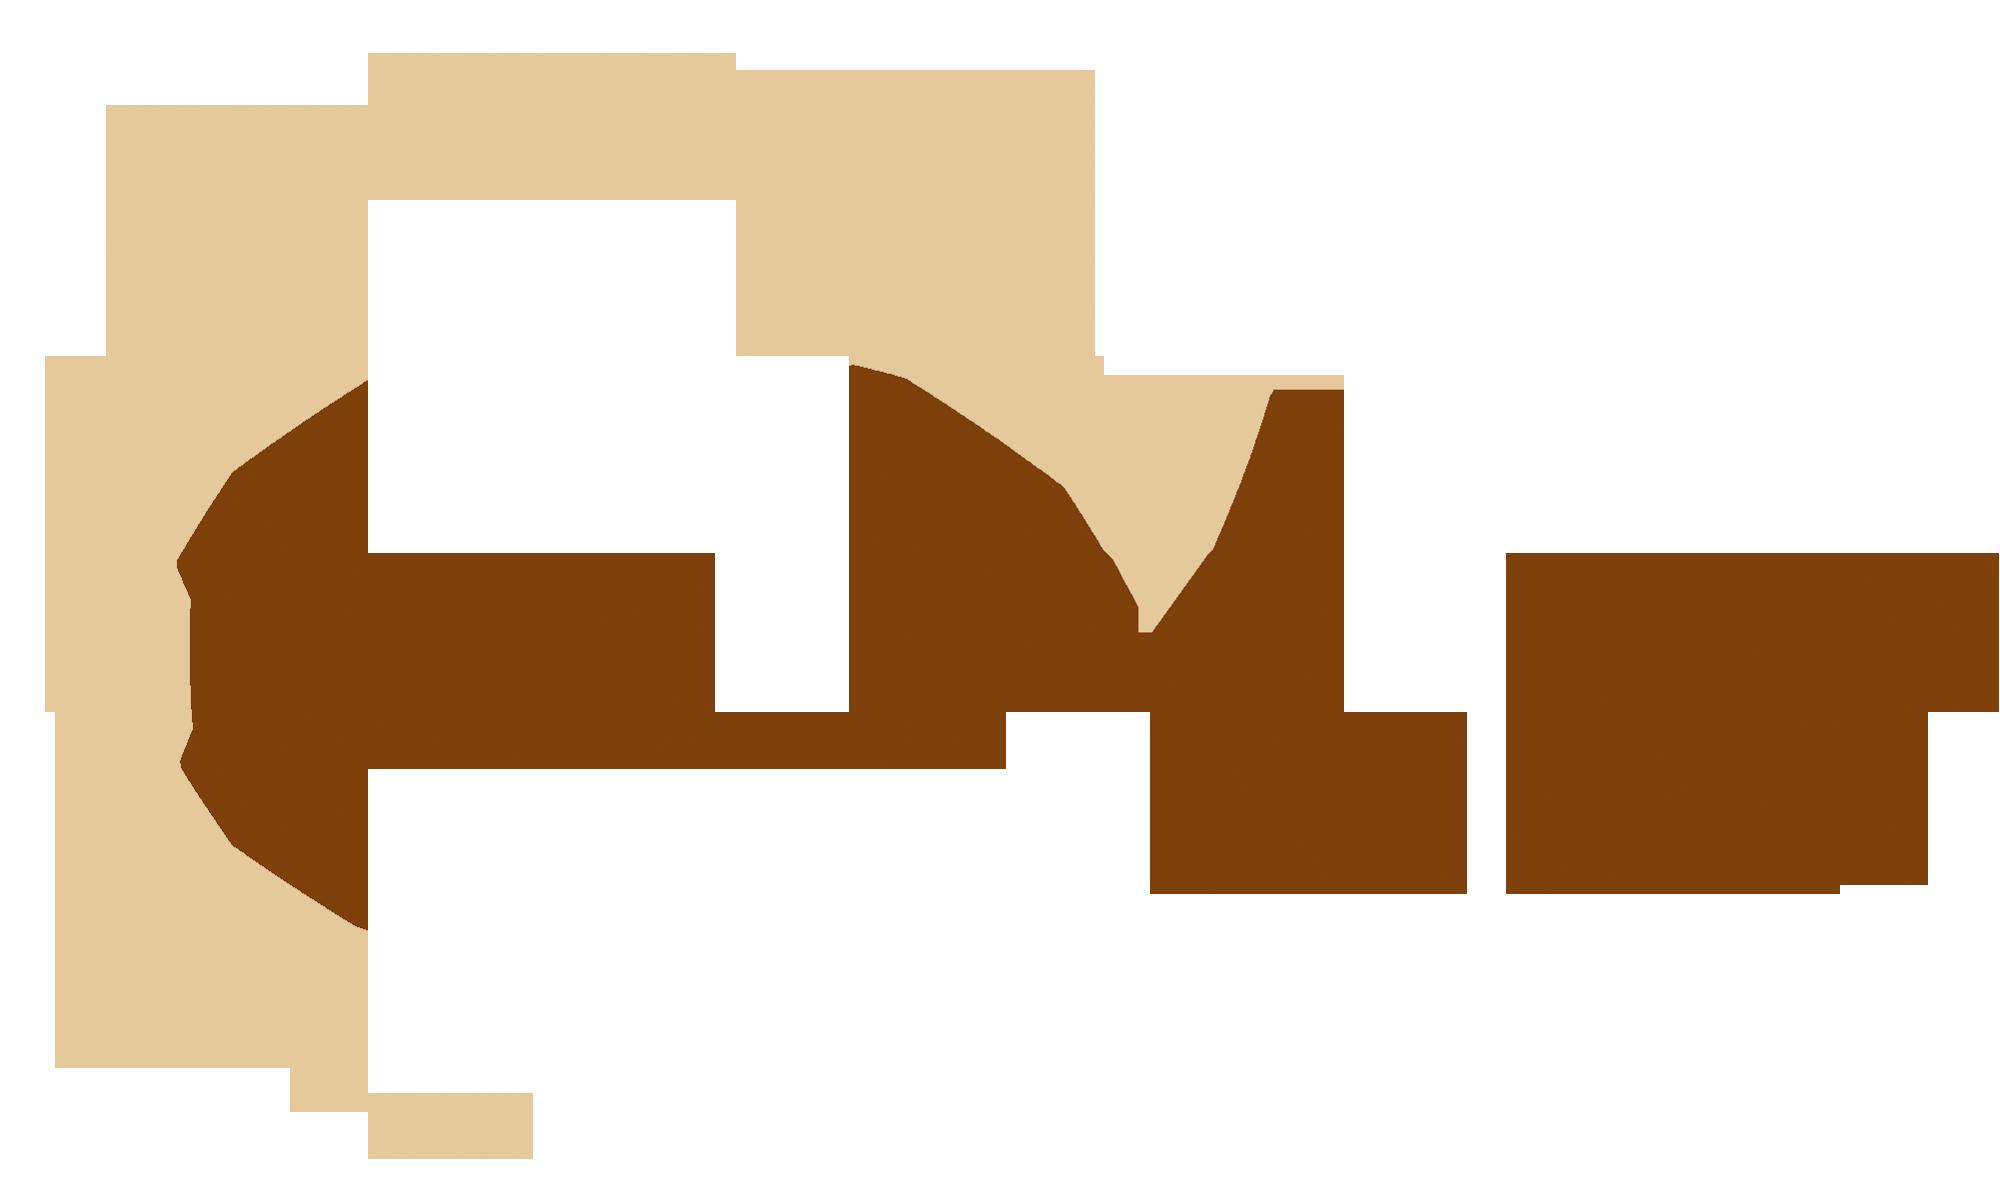 Gruppo Campari Eataly Enter Global Partnership Promoting